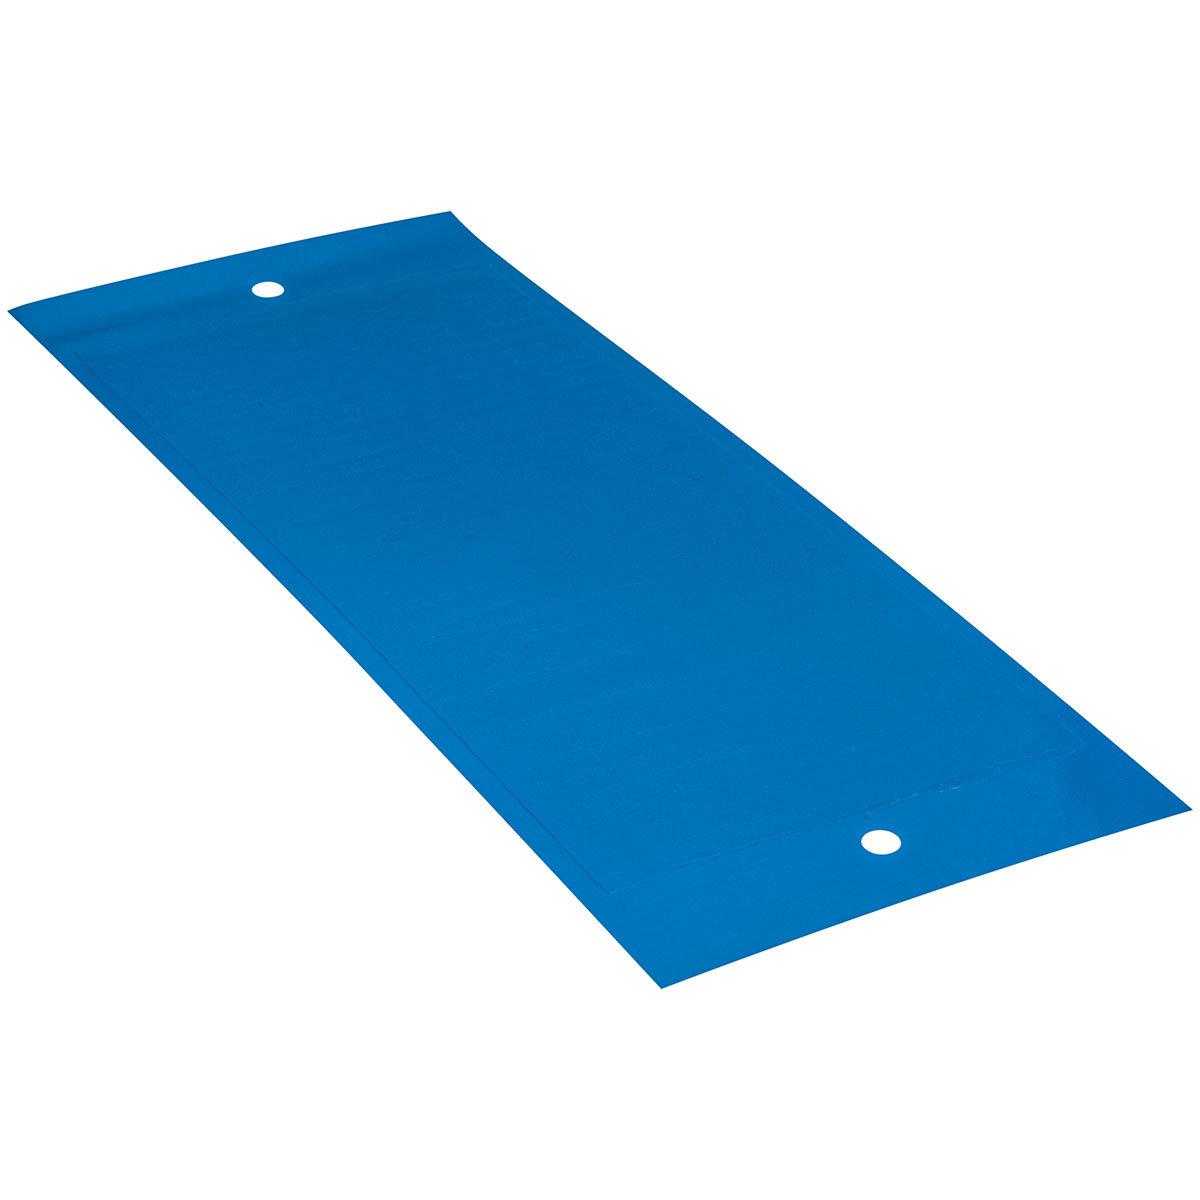 Blautafeln mit Aufhänger, 10 Stück | #3